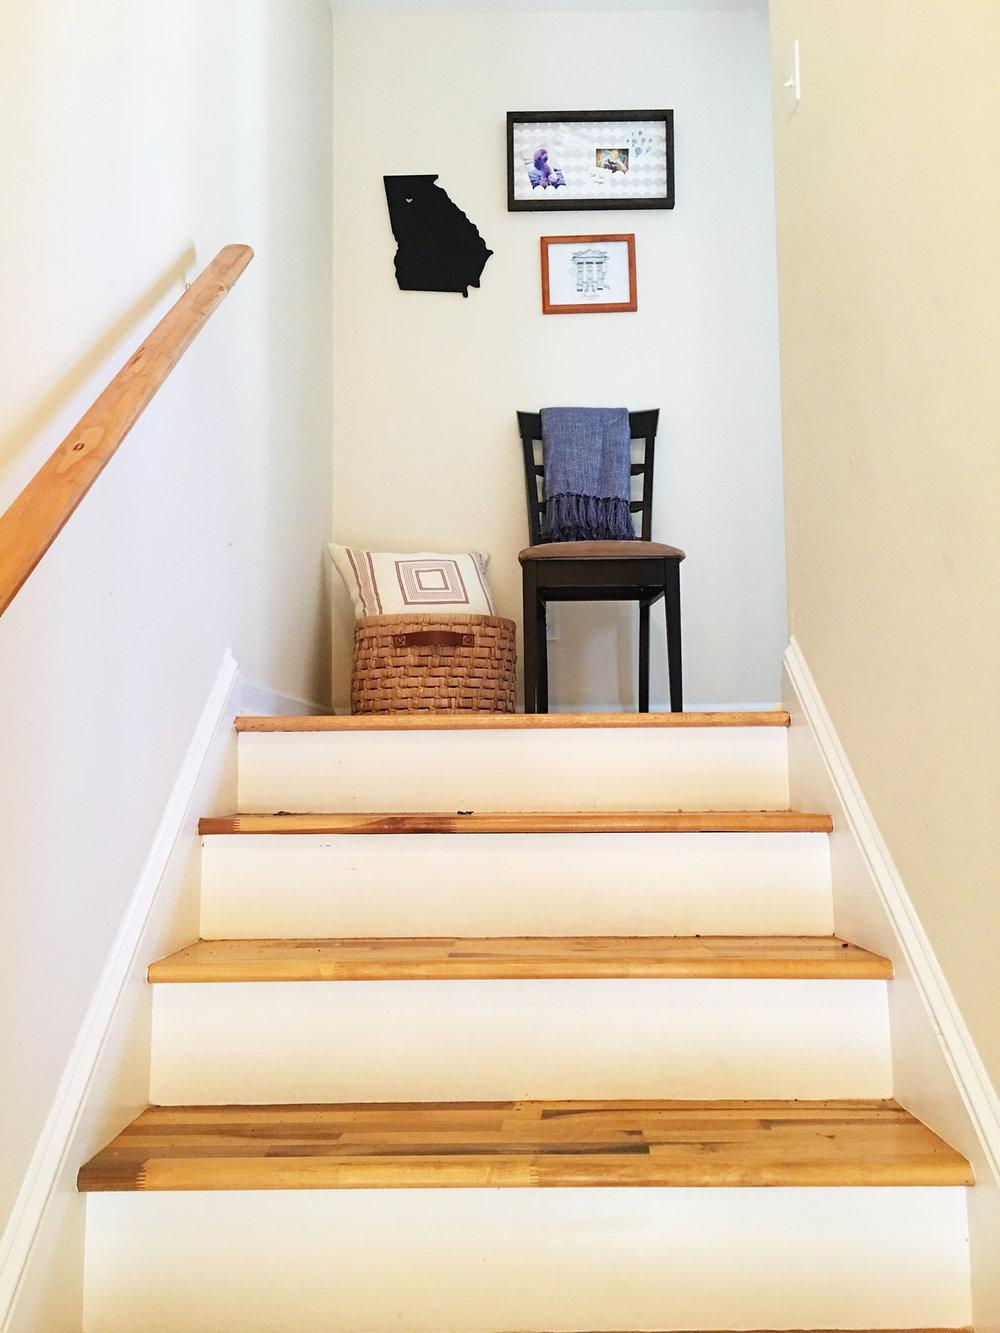 jo-torrijos-a-simpler-design-airbnb-styling-5.jpg